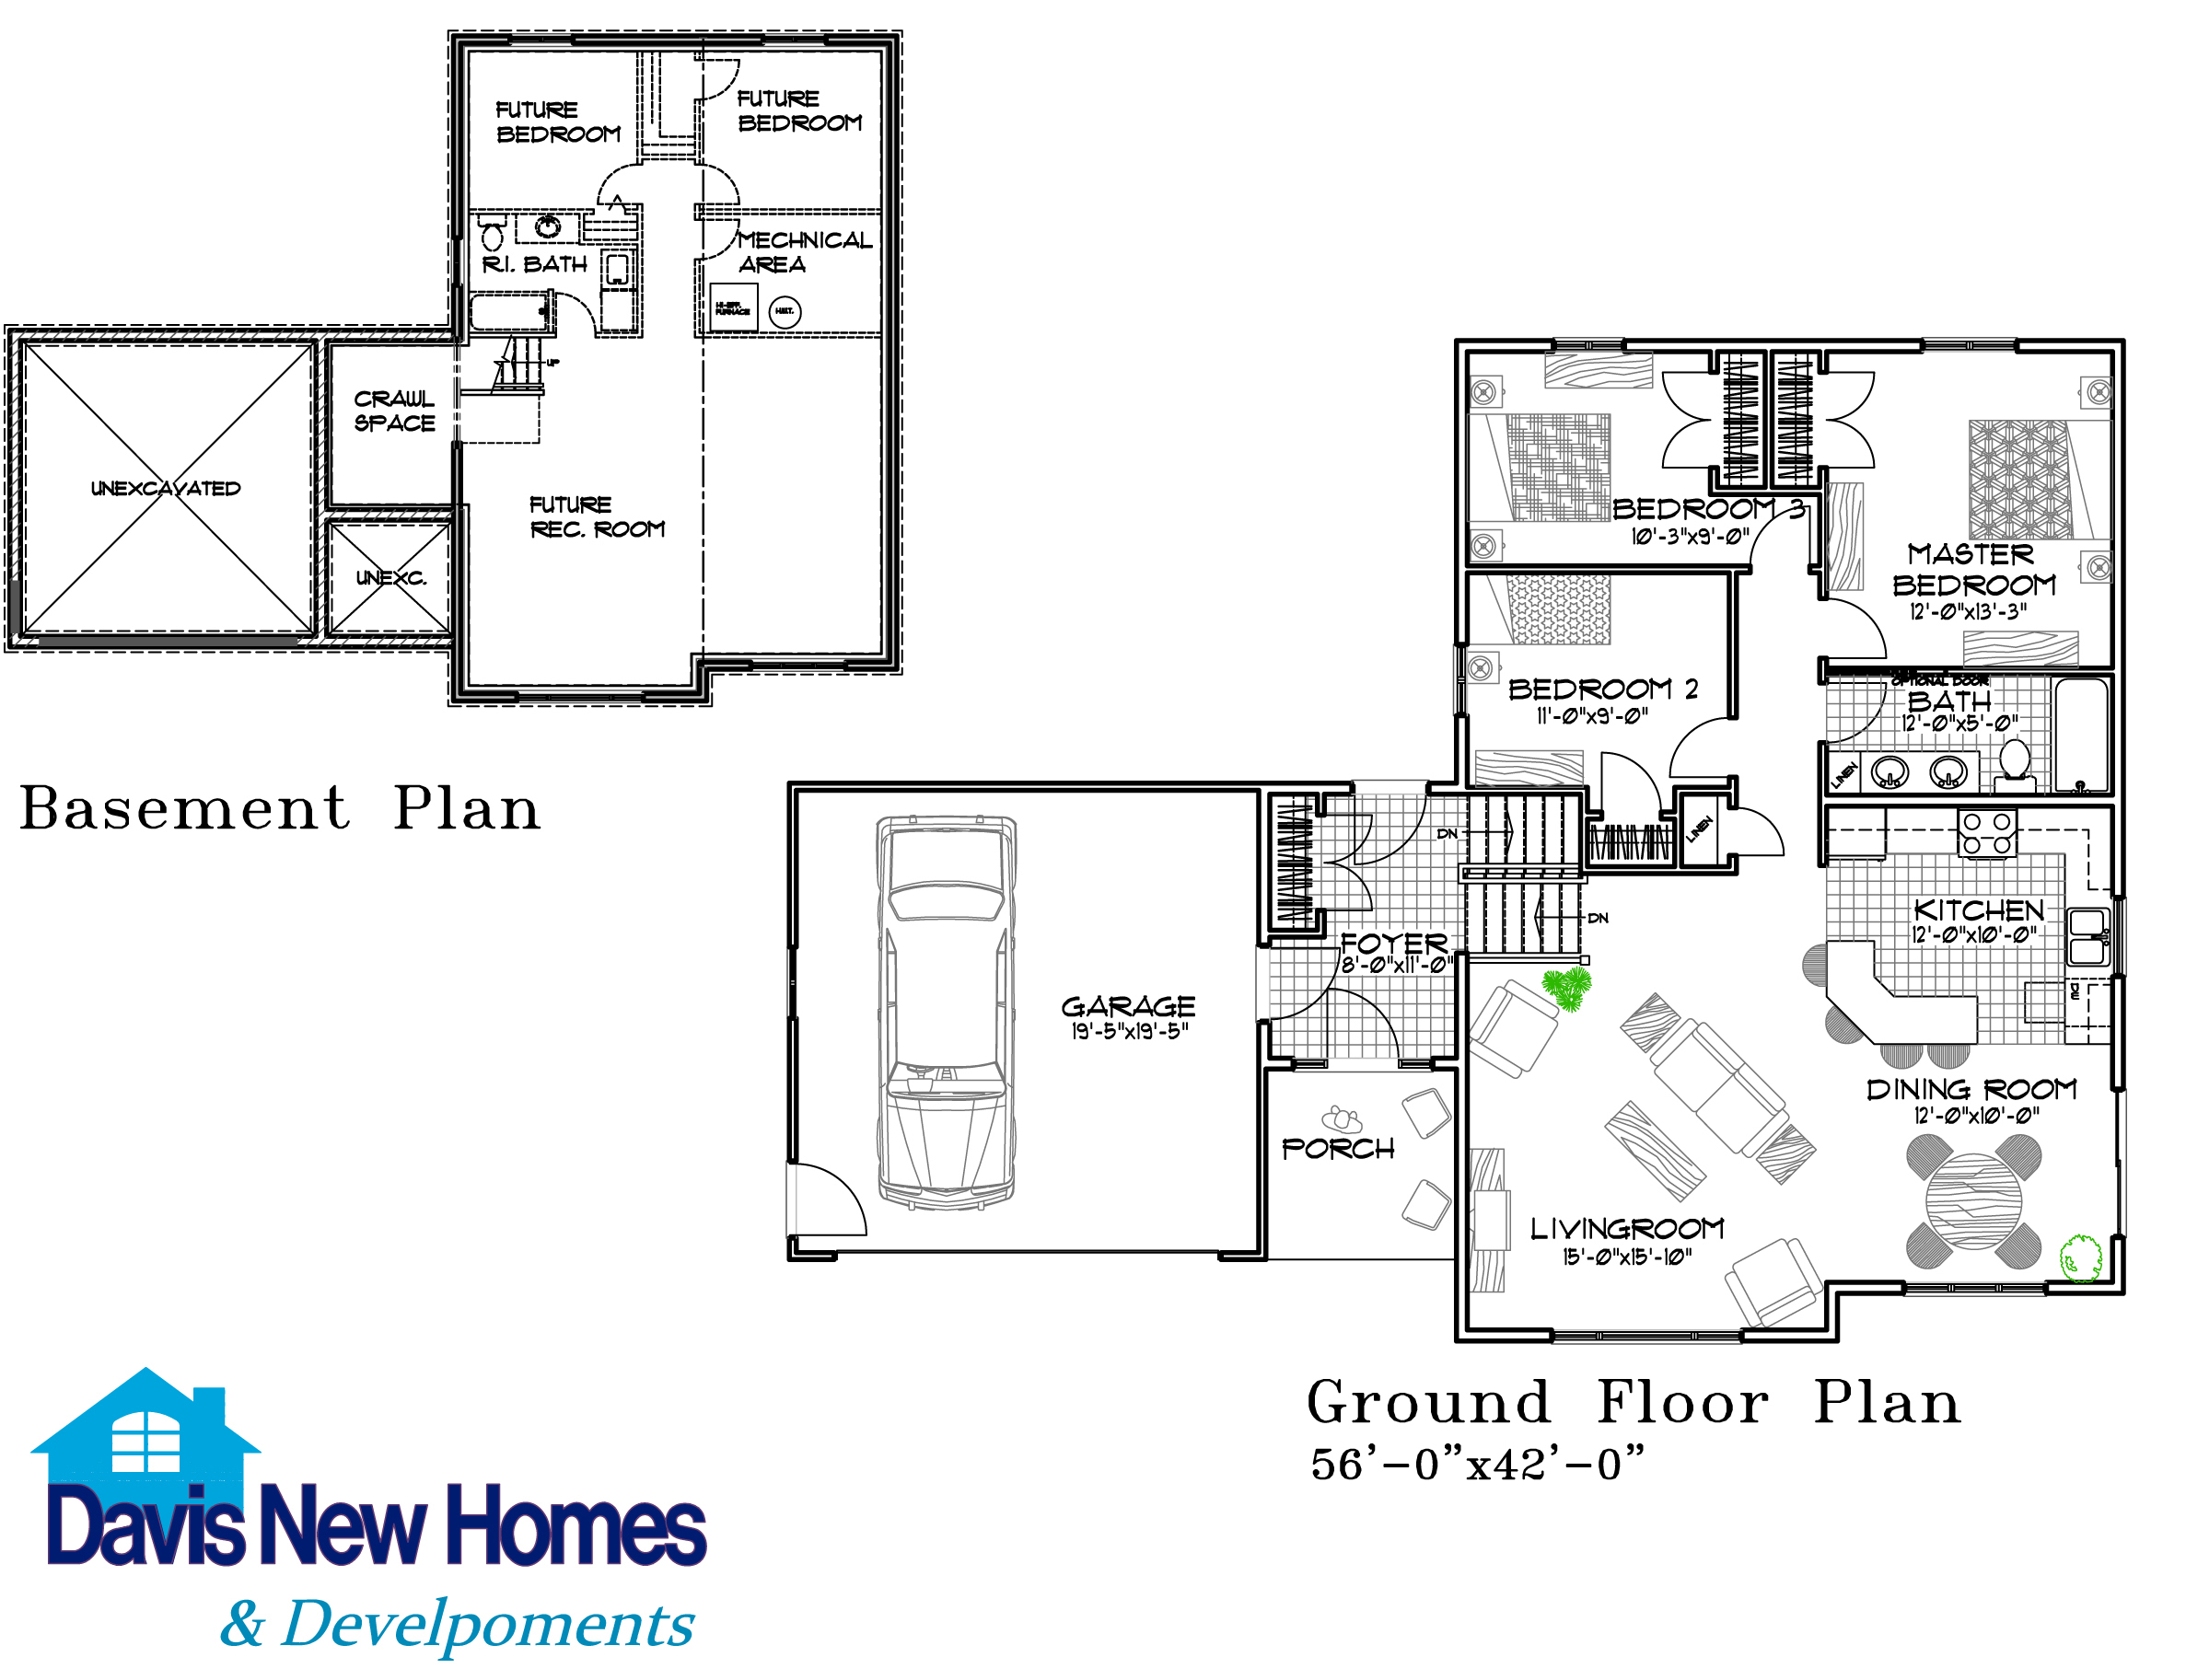 New homes image